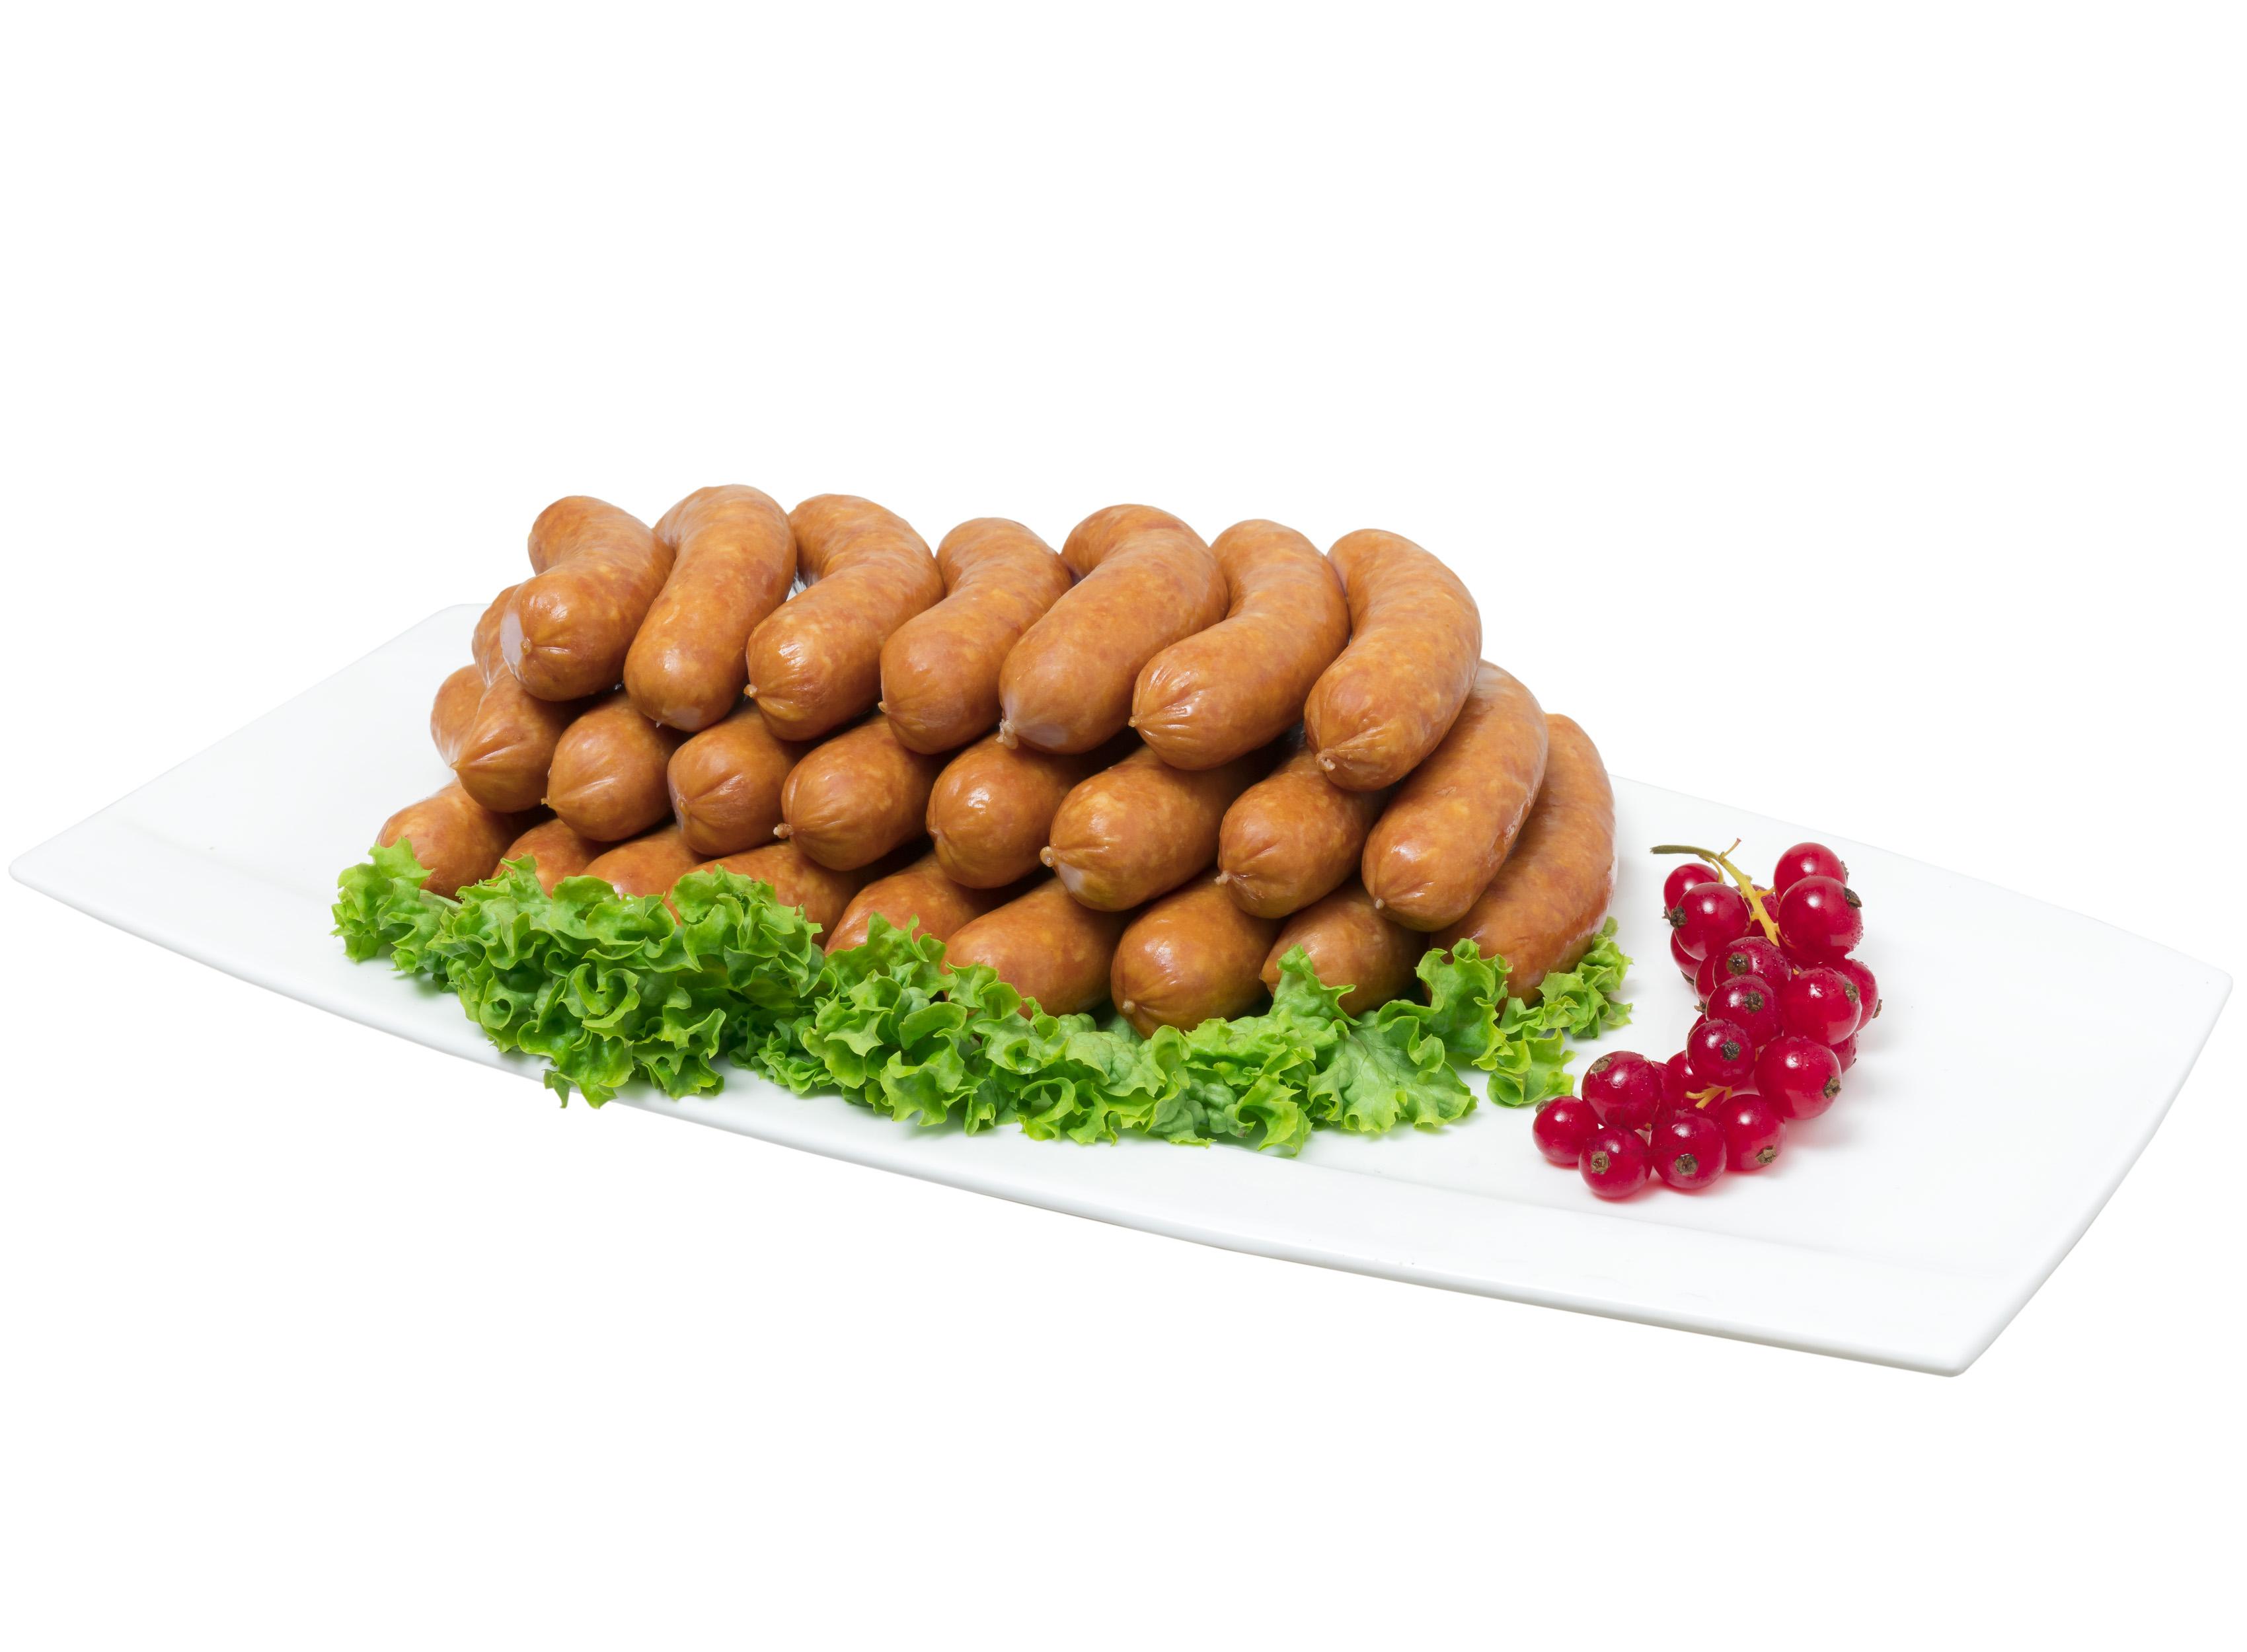 Kornetki - delikate Würstchen 0,5Kg von Poliwczak